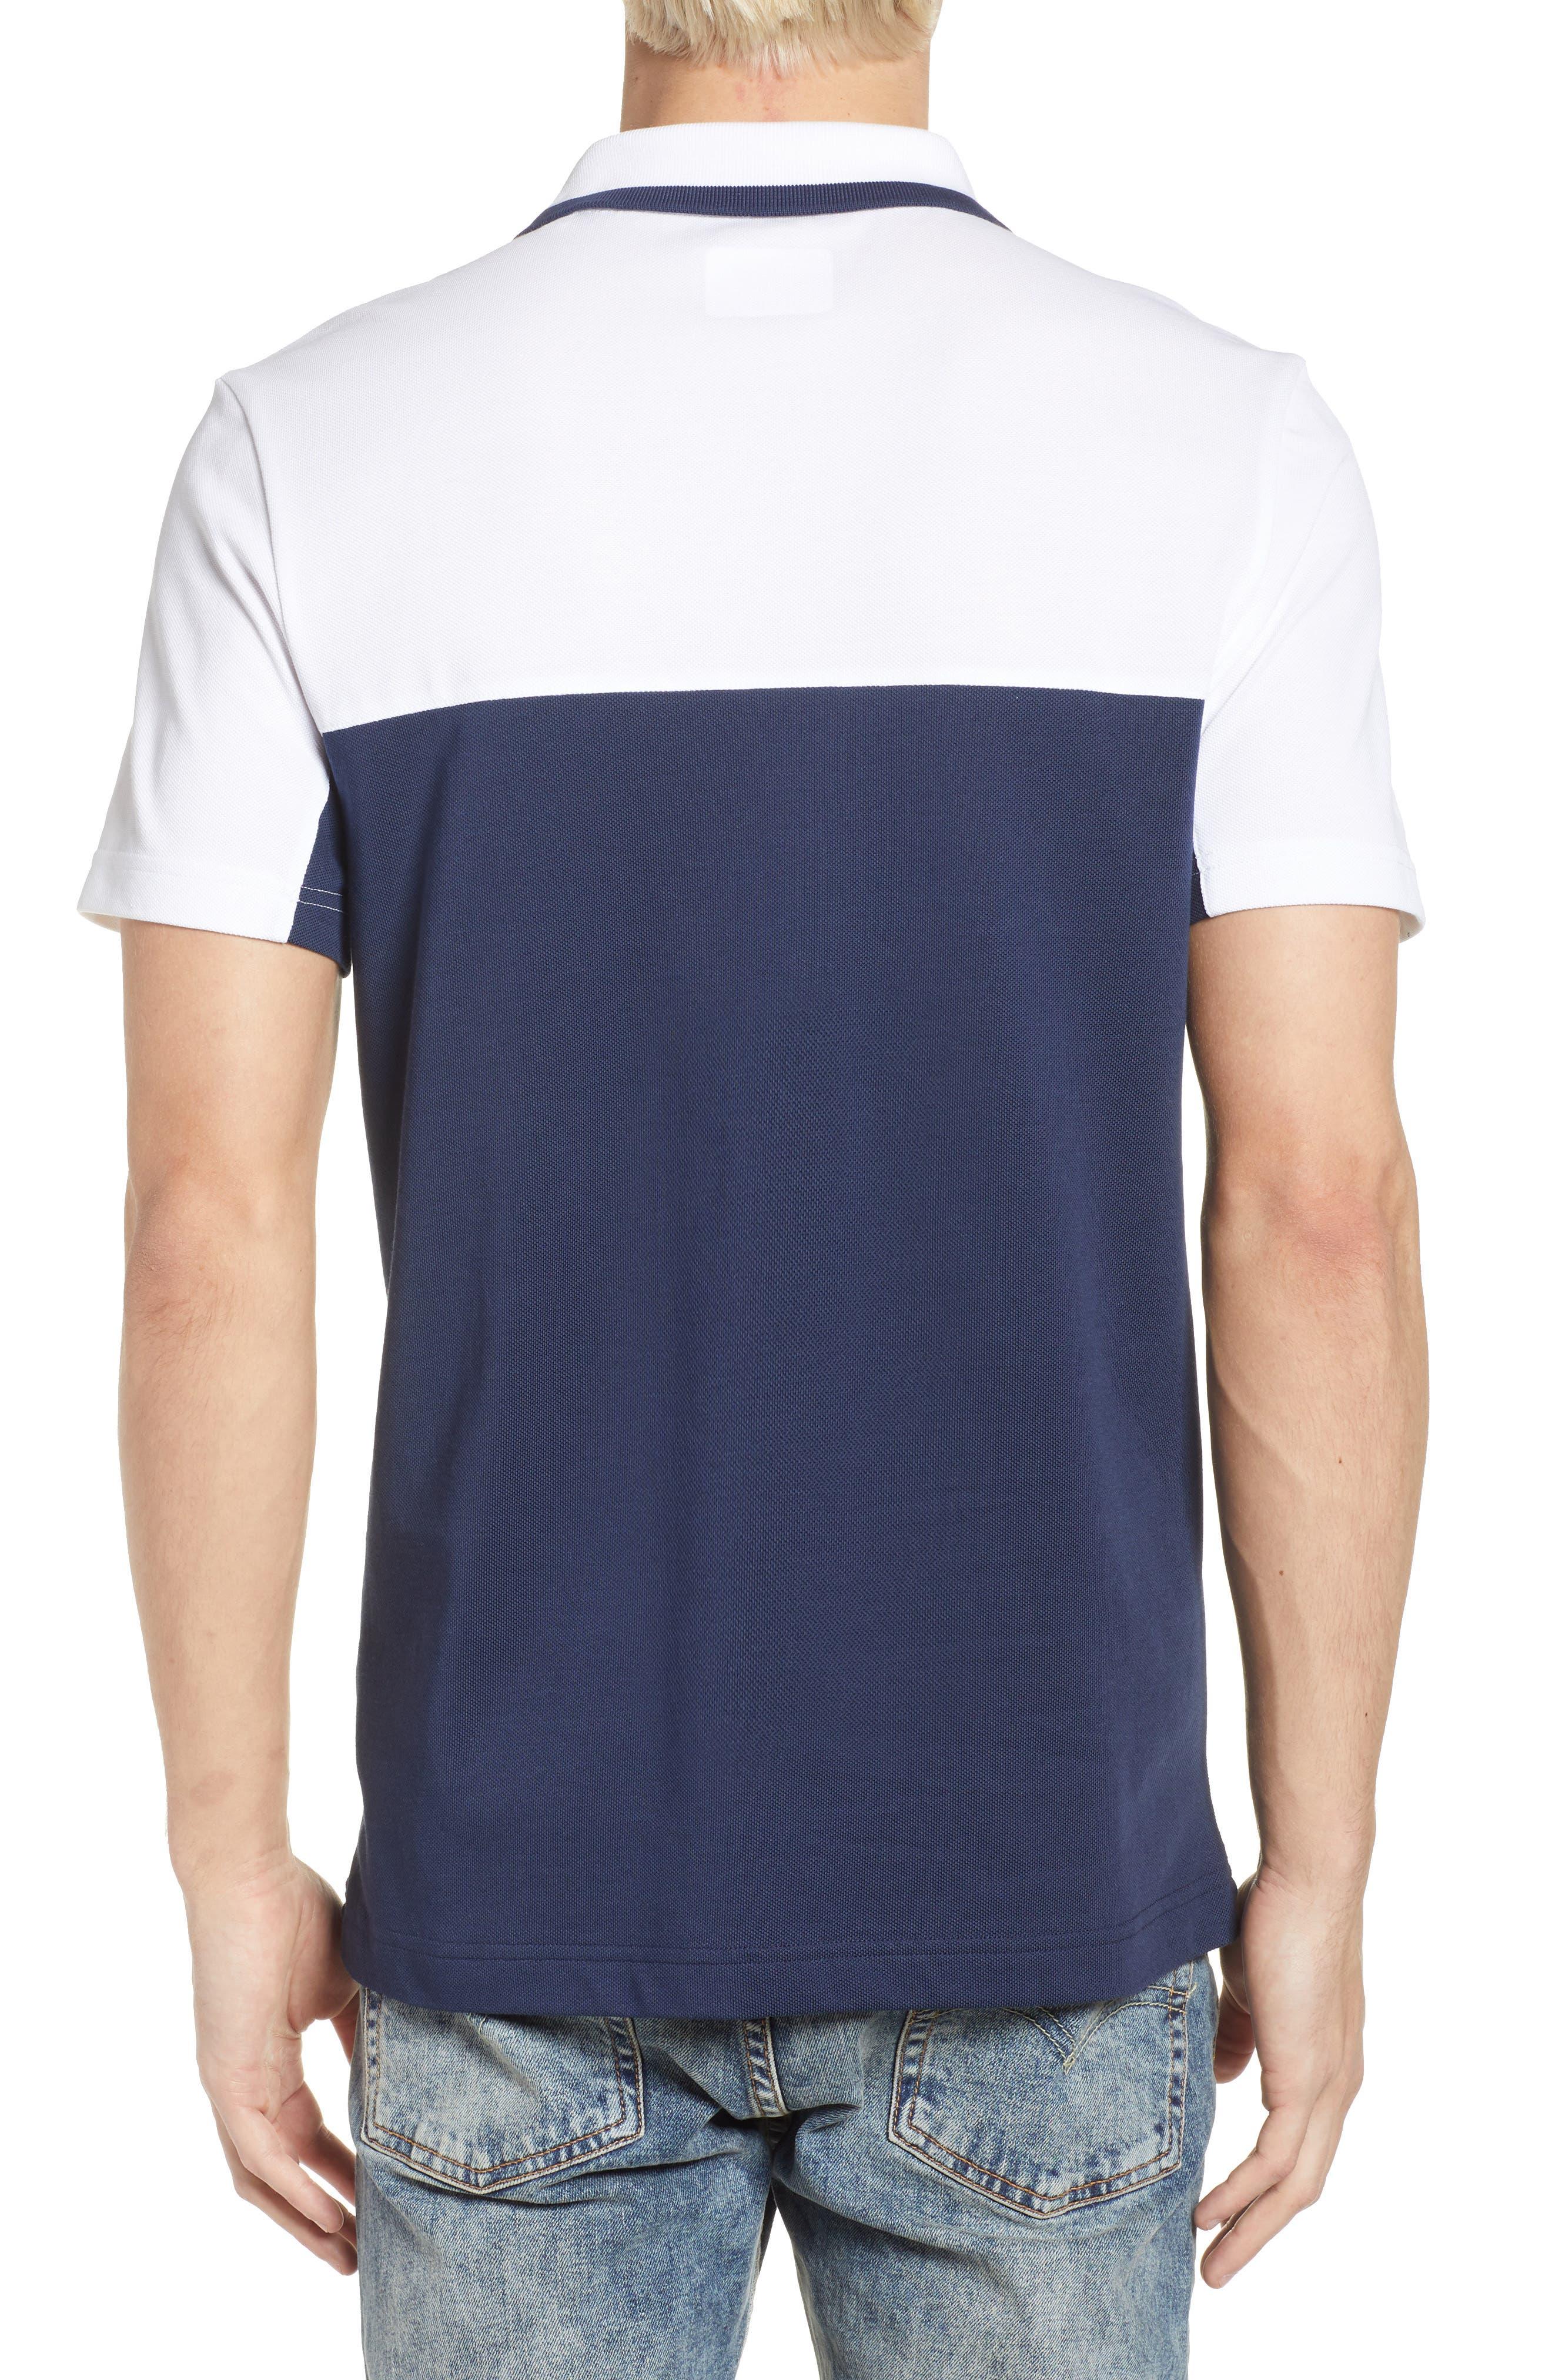 Piqué Cotton Blend Polo,                             Alternate thumbnail 2, color,                             White/ Navy Blue